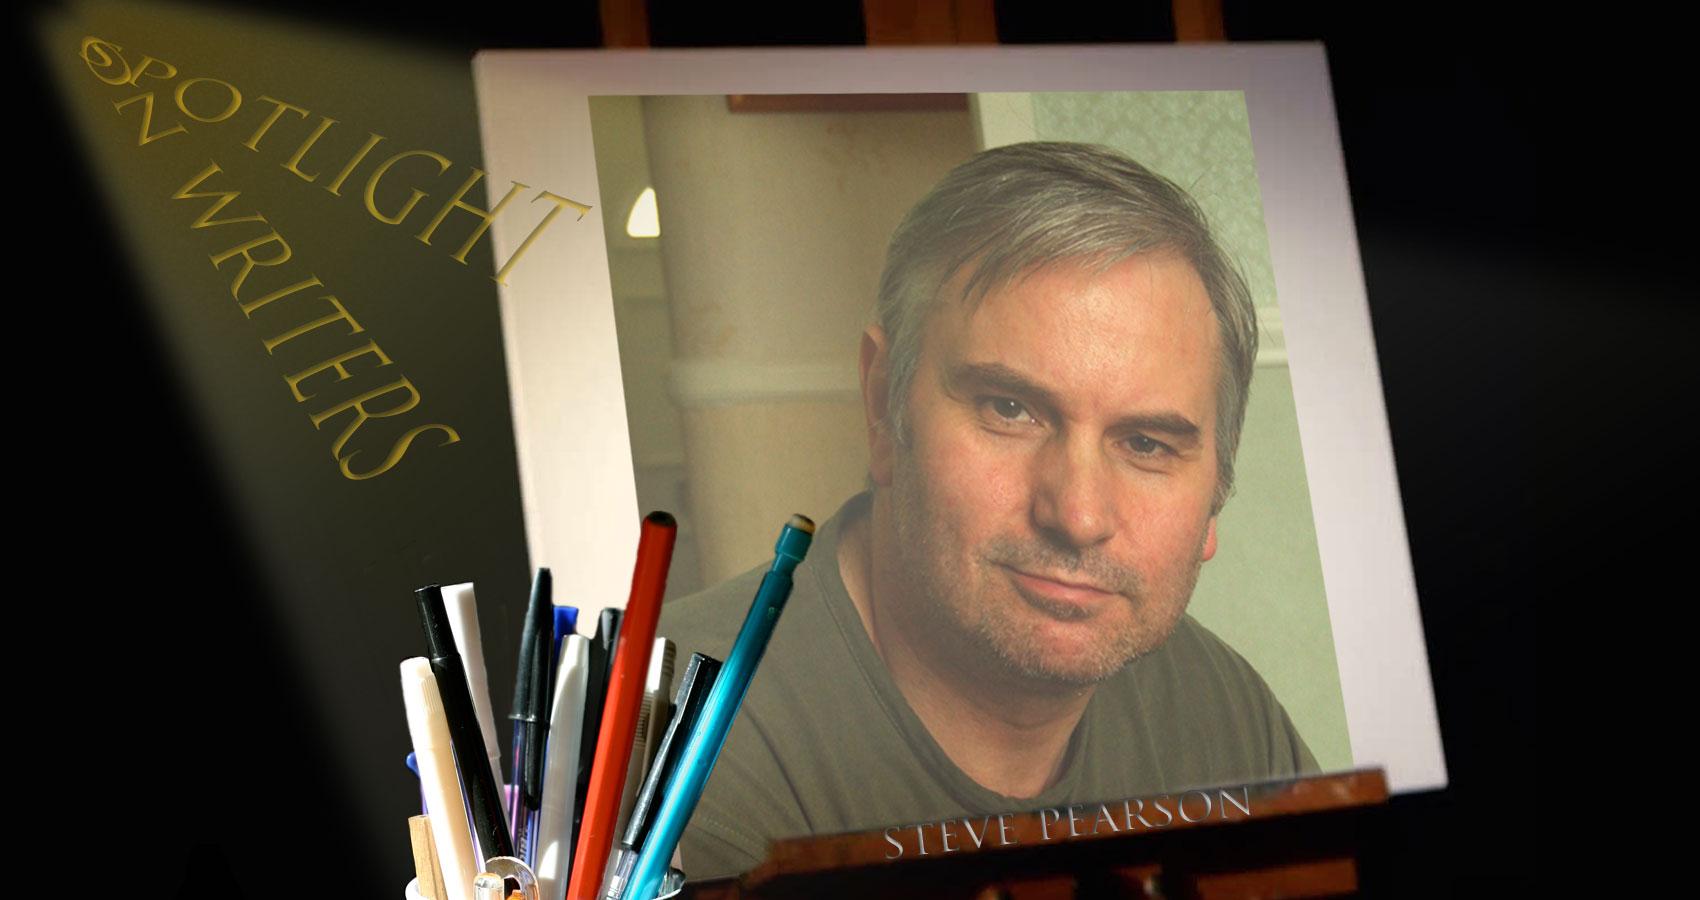 Spotlight On Writers - Steve Pearson at Spillwords.com